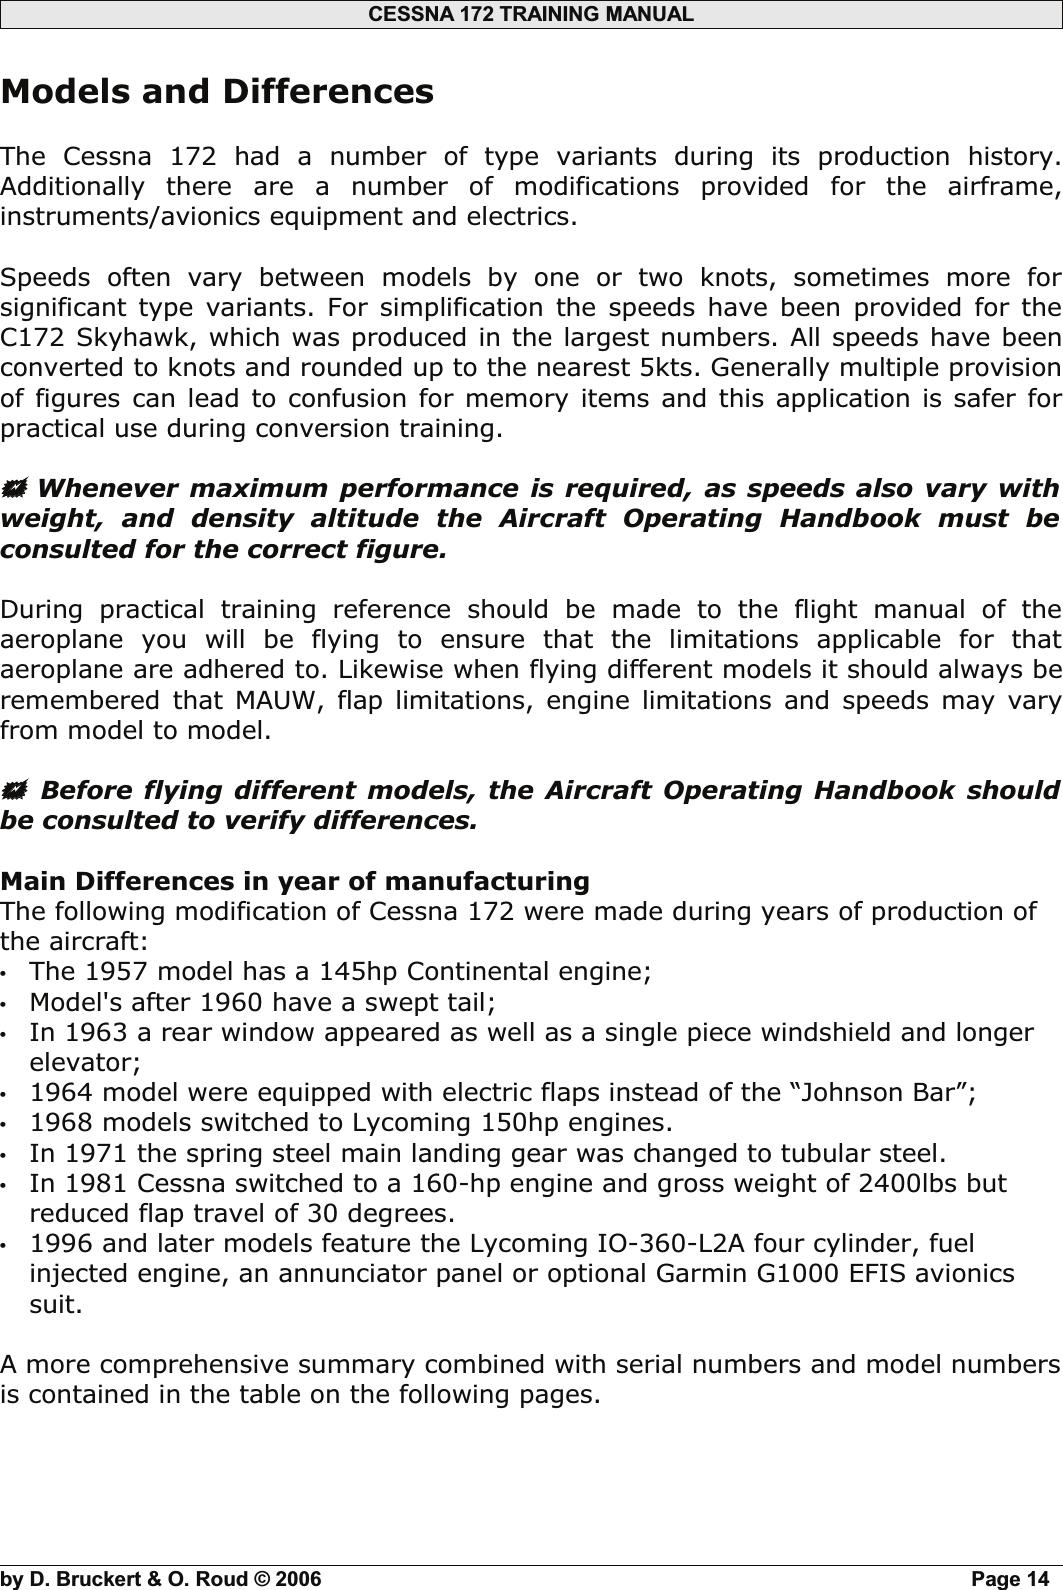 C182 Cessna_C172 History_RSV Training Manuals_2011 Cessna